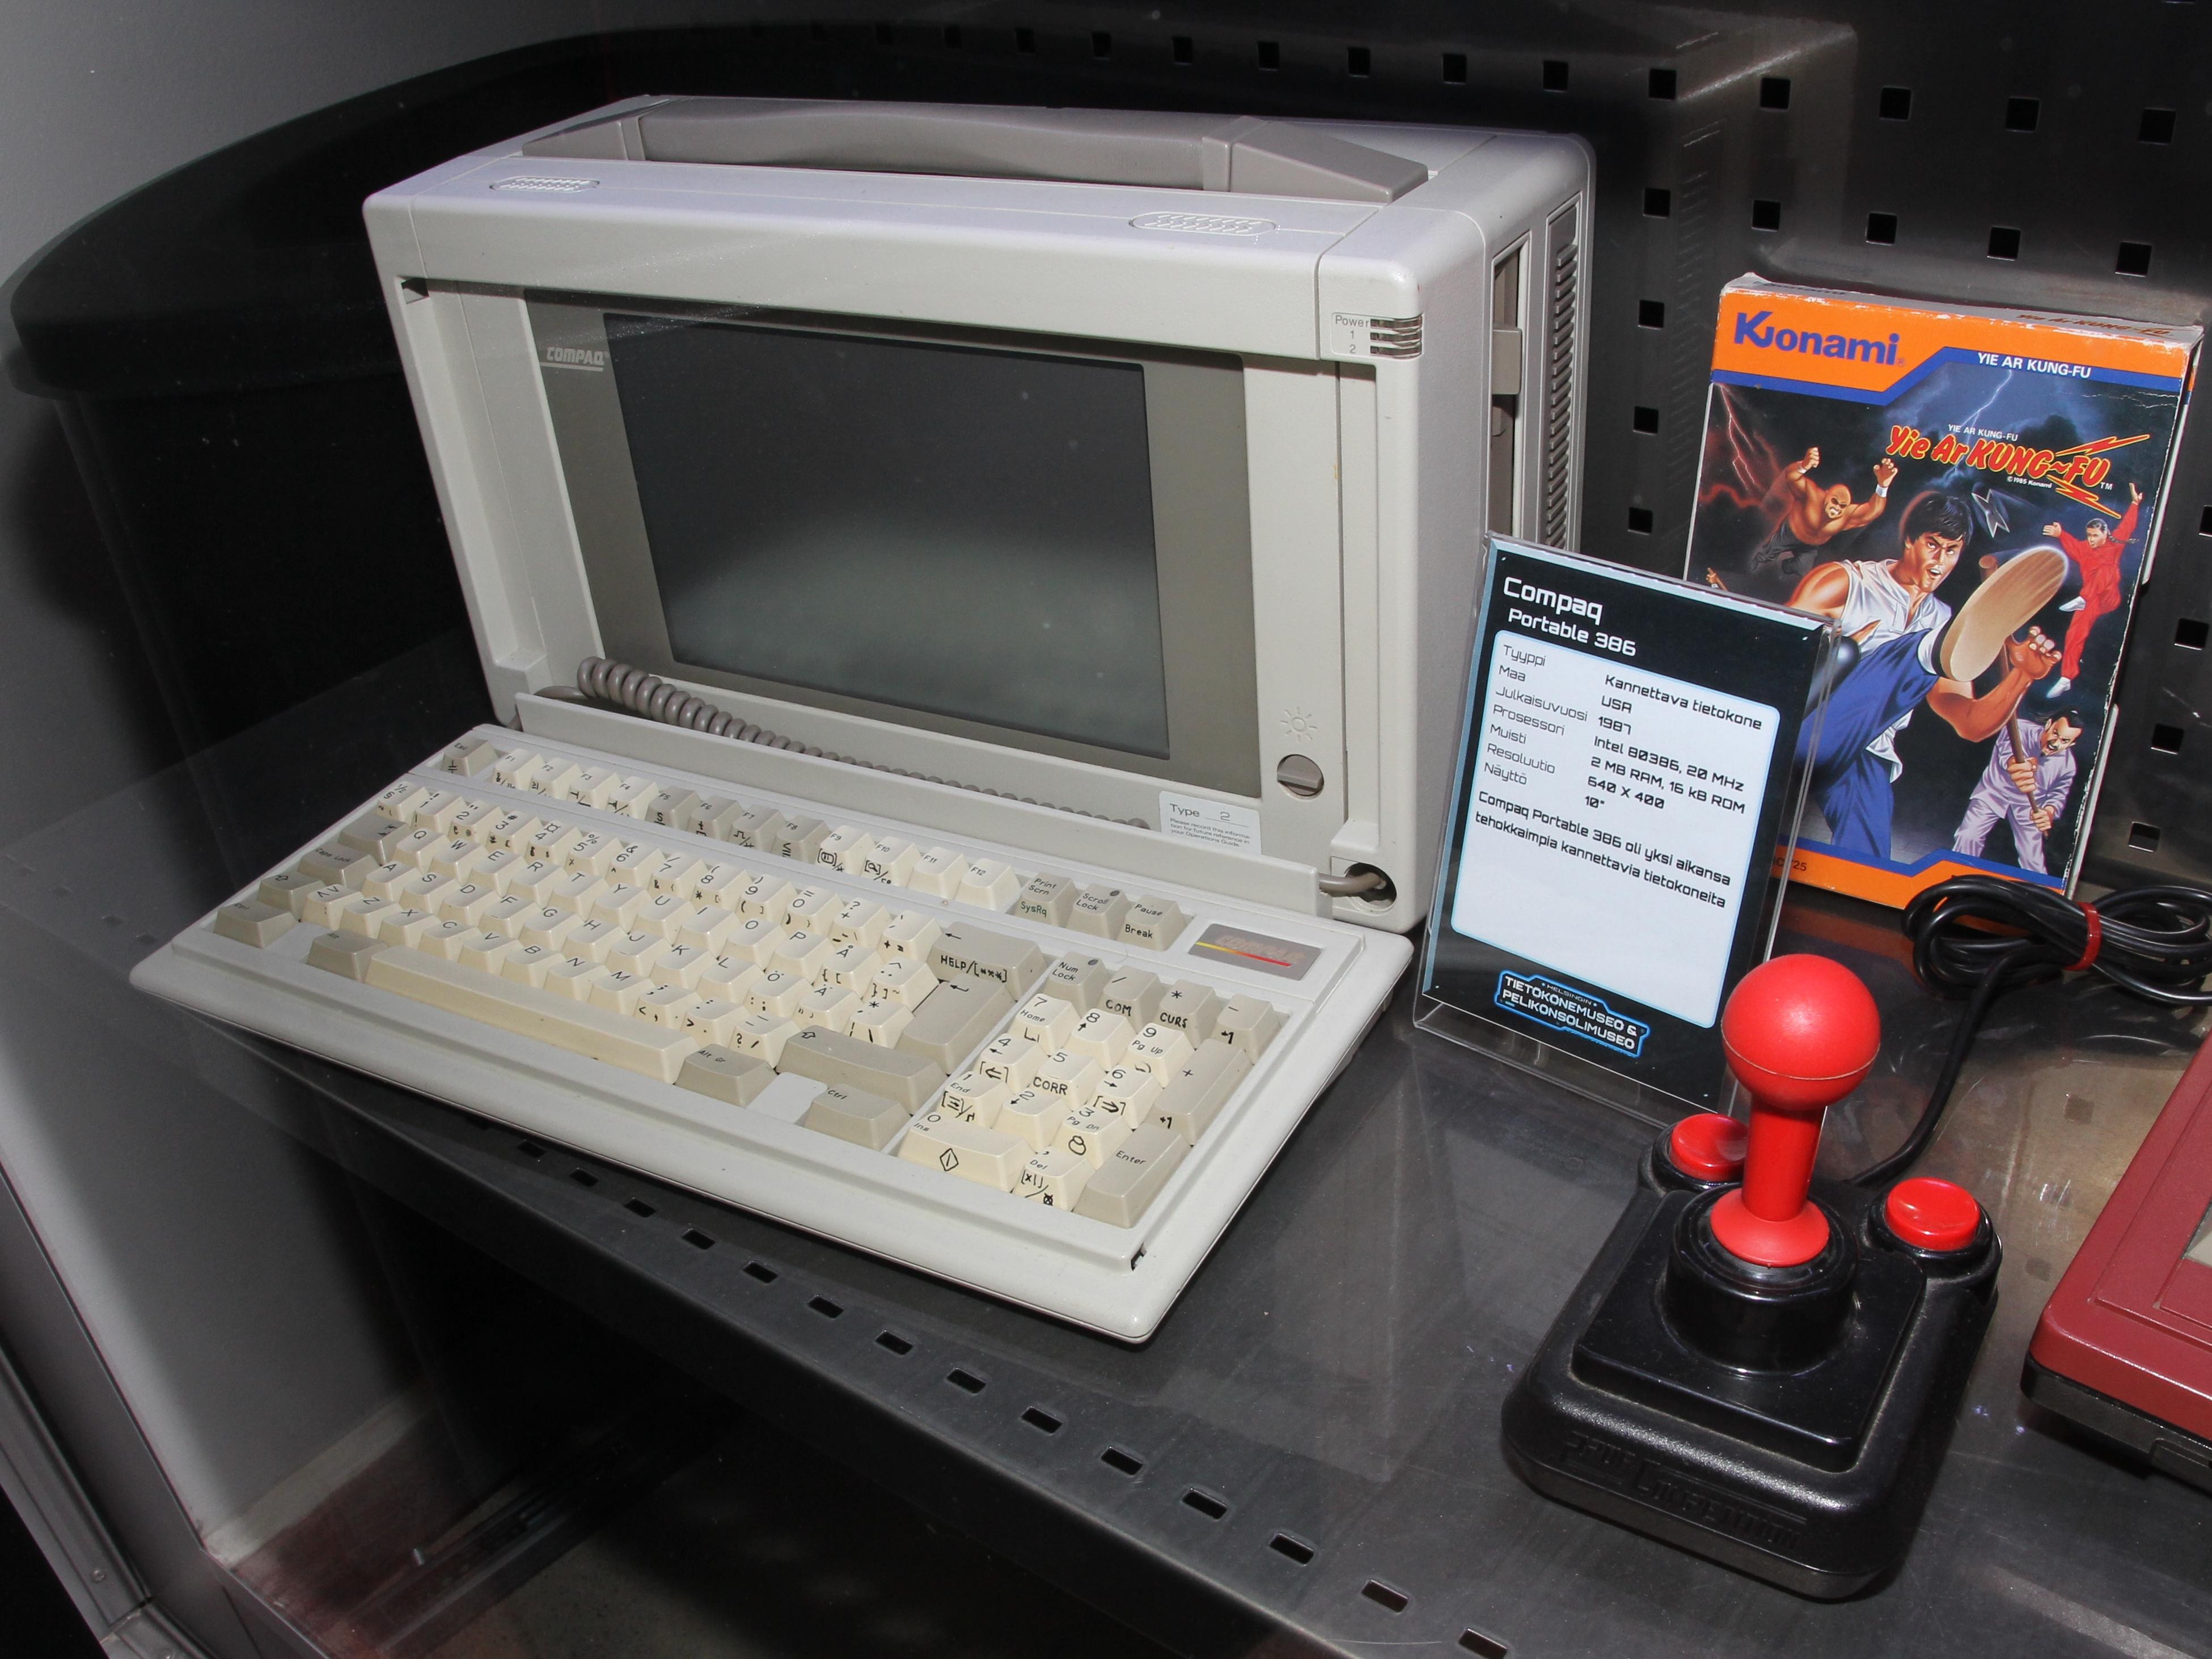 Tietokone Laukku 17 : File compaq portable tietokonemuseo g wikimedia